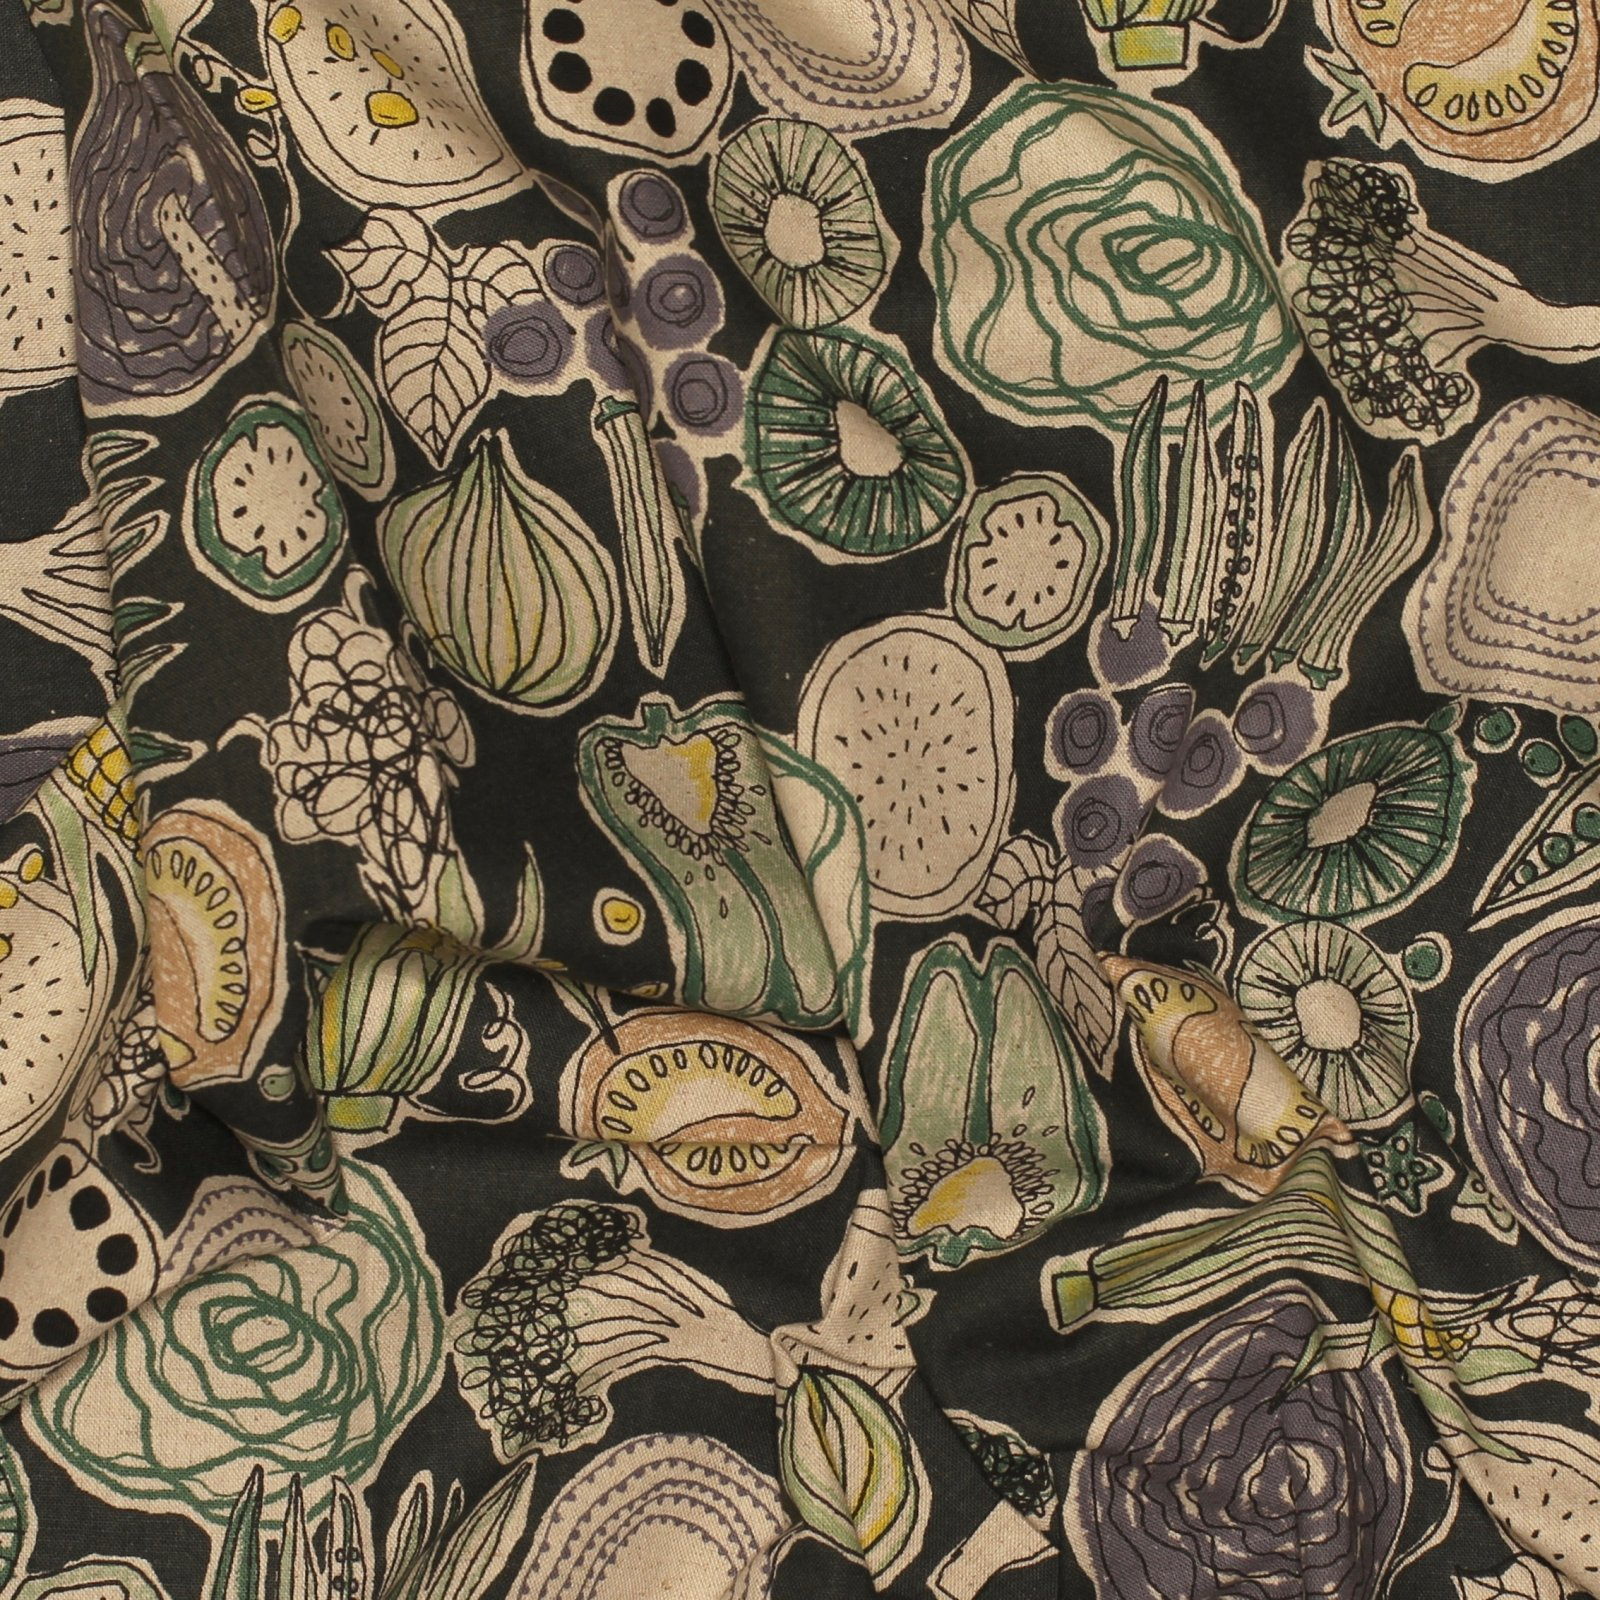 Pastel Veggies on Charcoal - Japanese Cotton/Linen Canvas